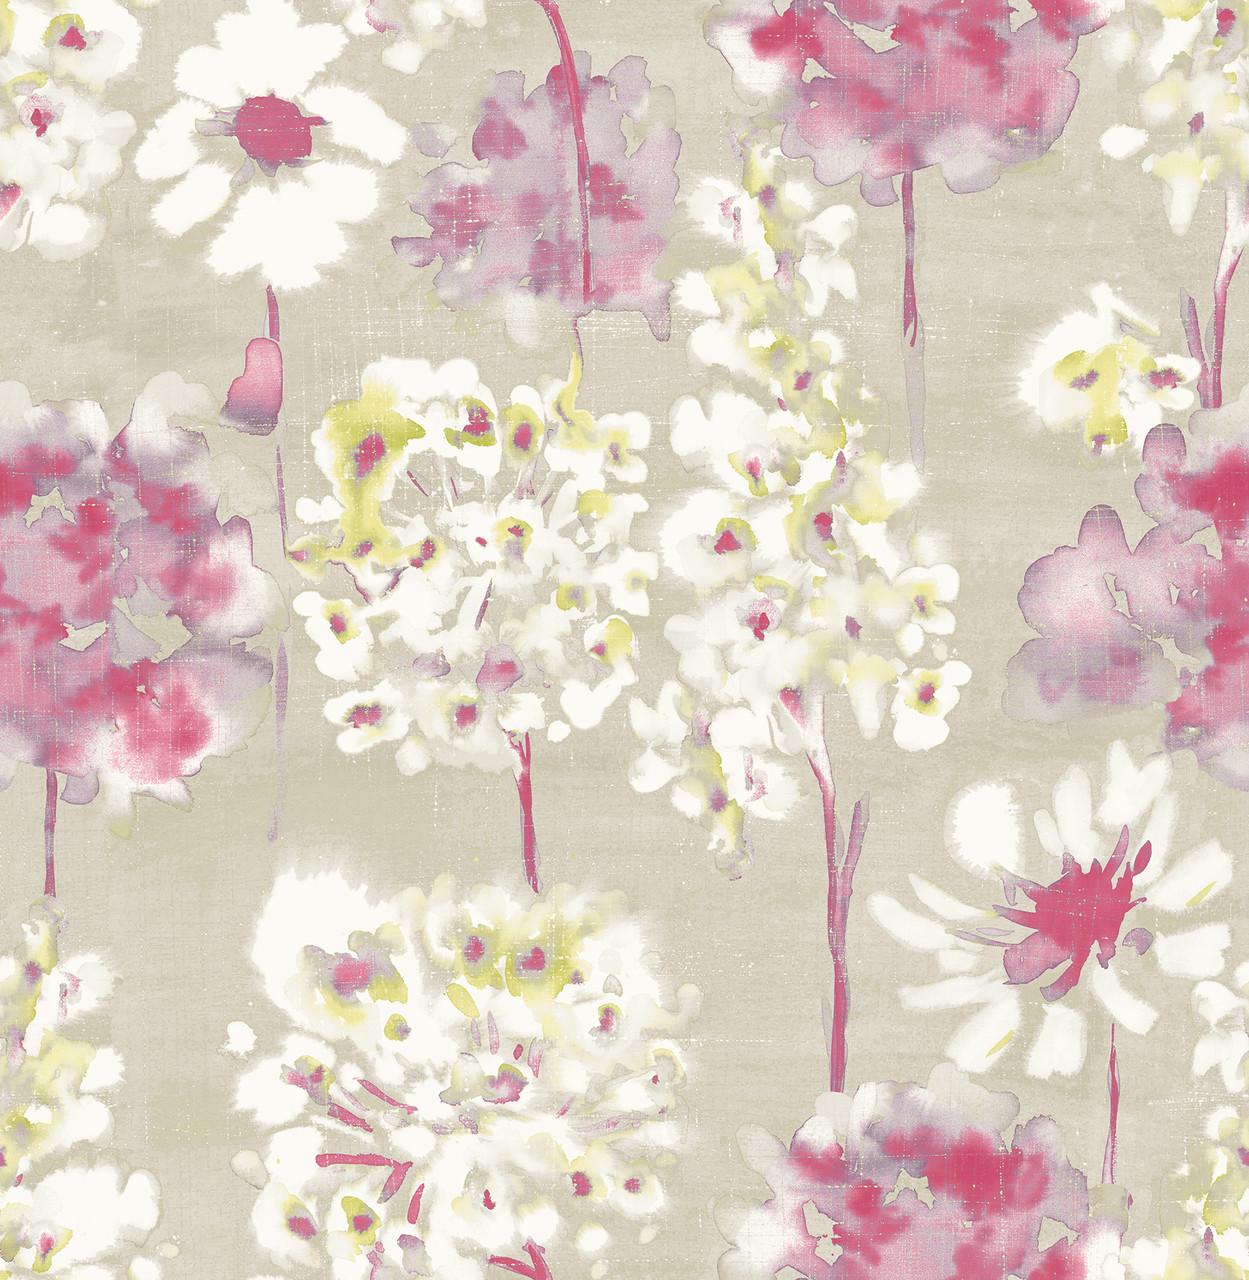 Marilla Pink Watercolor Floral 2656 004019 Wallpaper